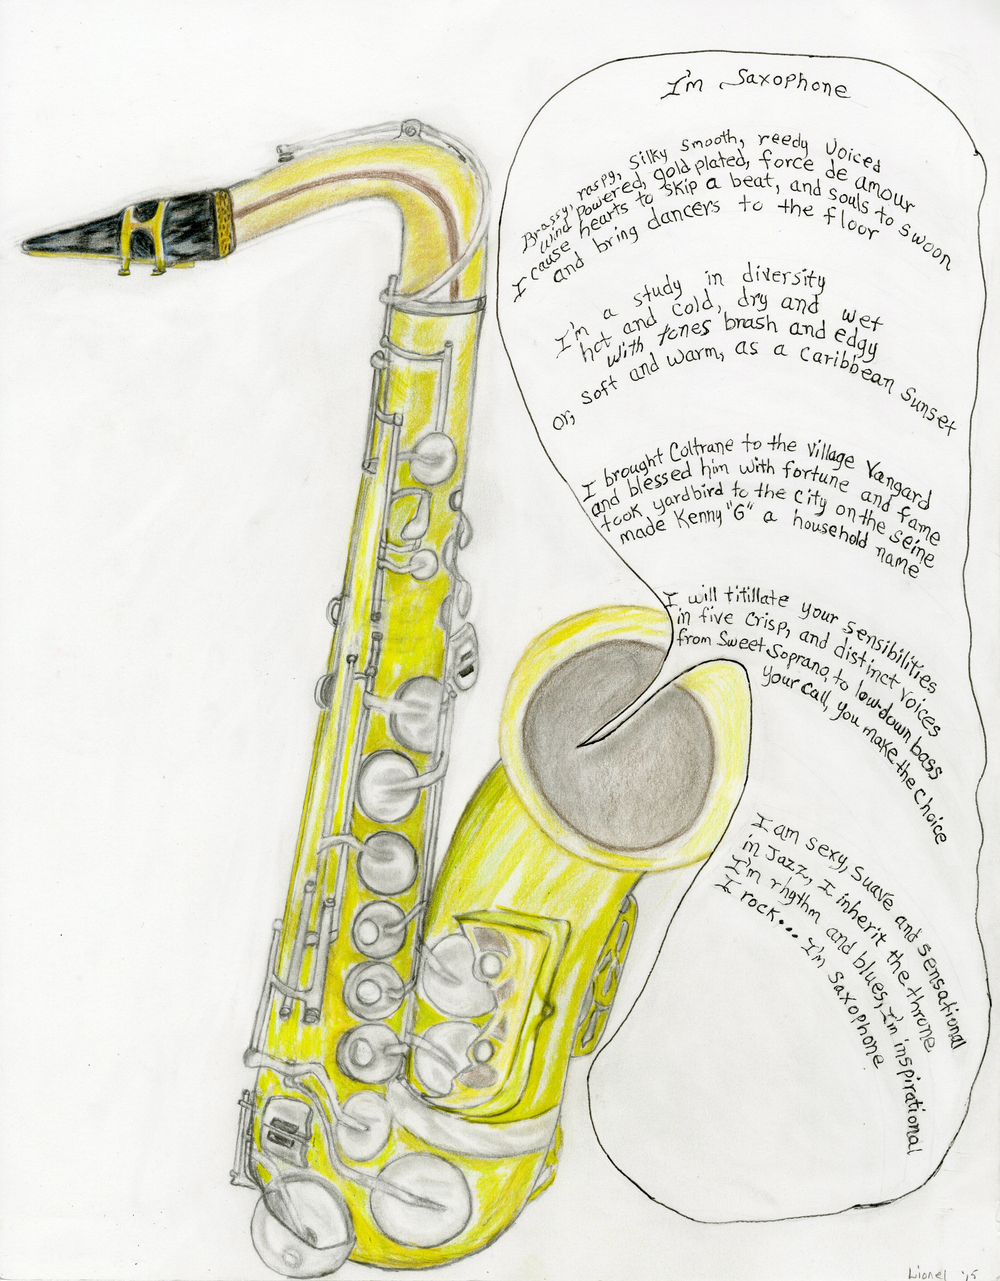 Lionel W. - I Am Saxophone